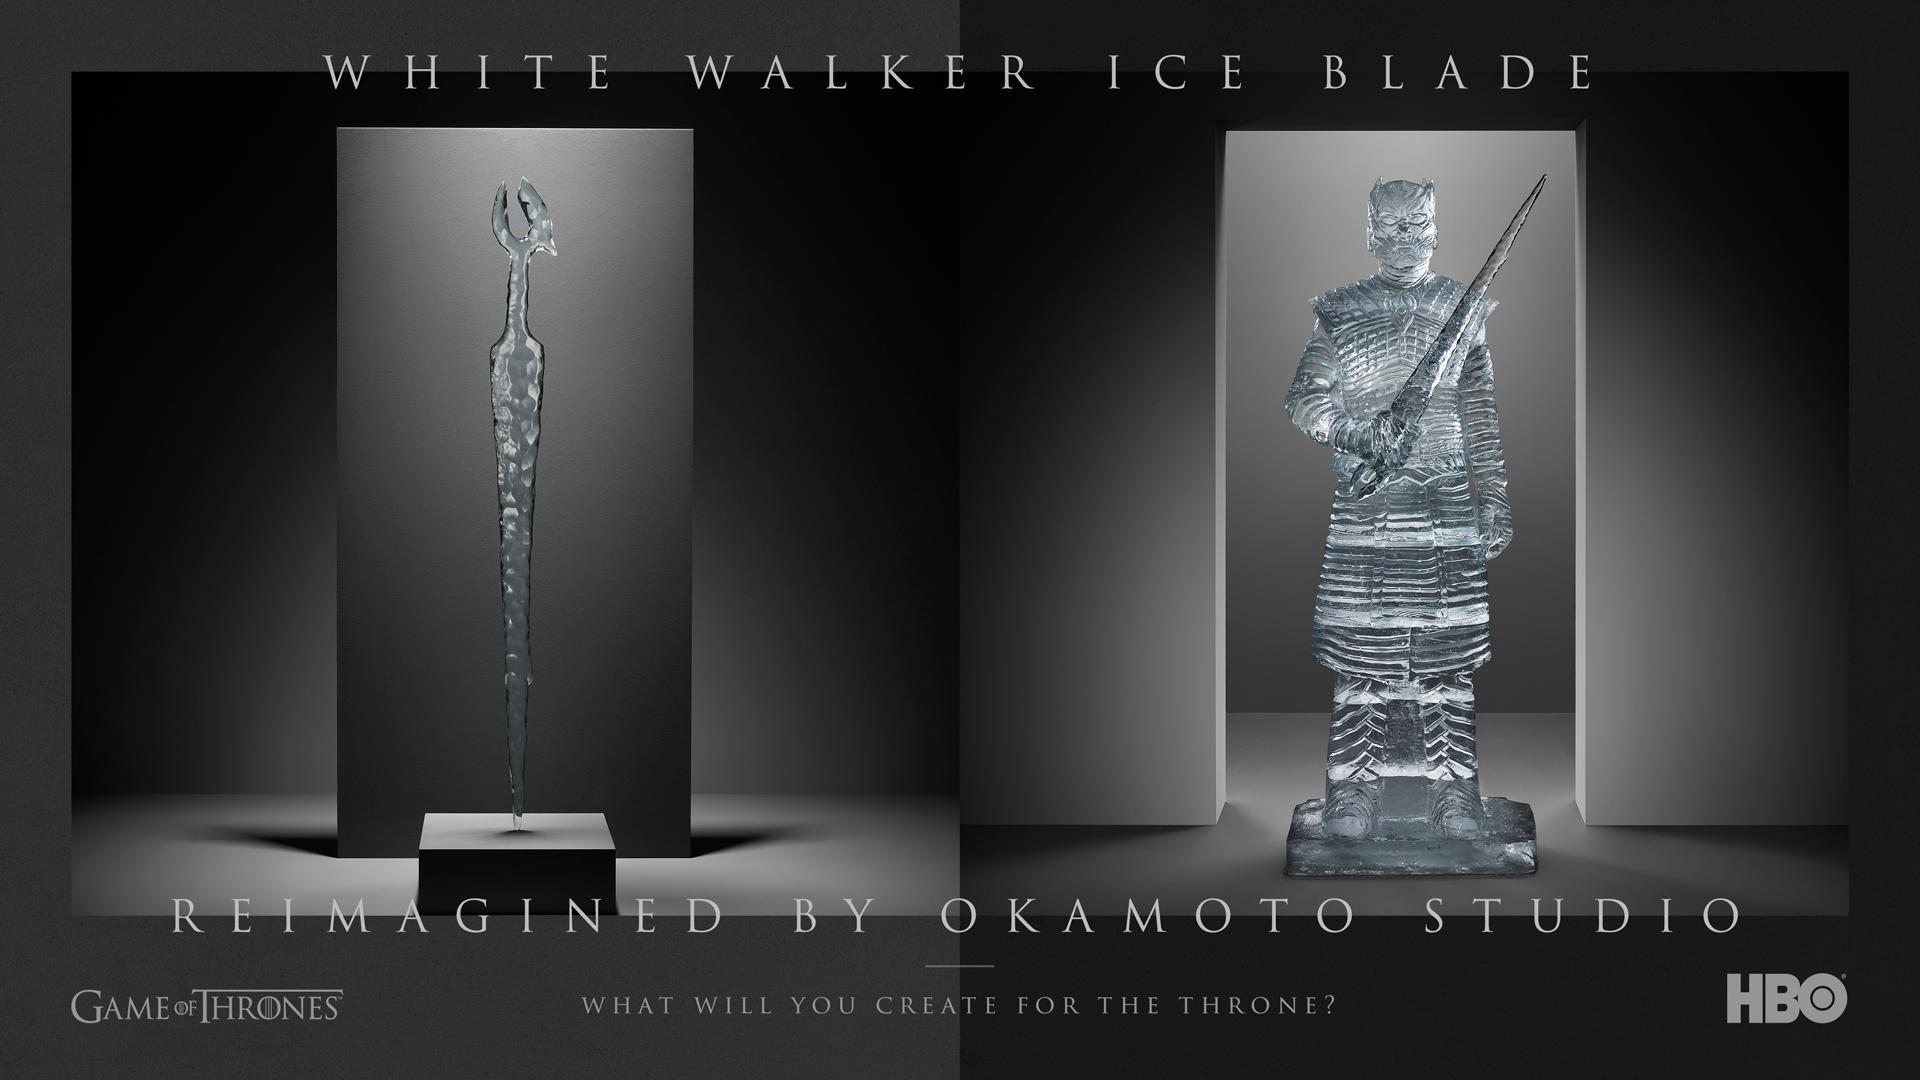 05_NOTW_White_Walker_Ice_Blade_Okamoto_Studio.jpg